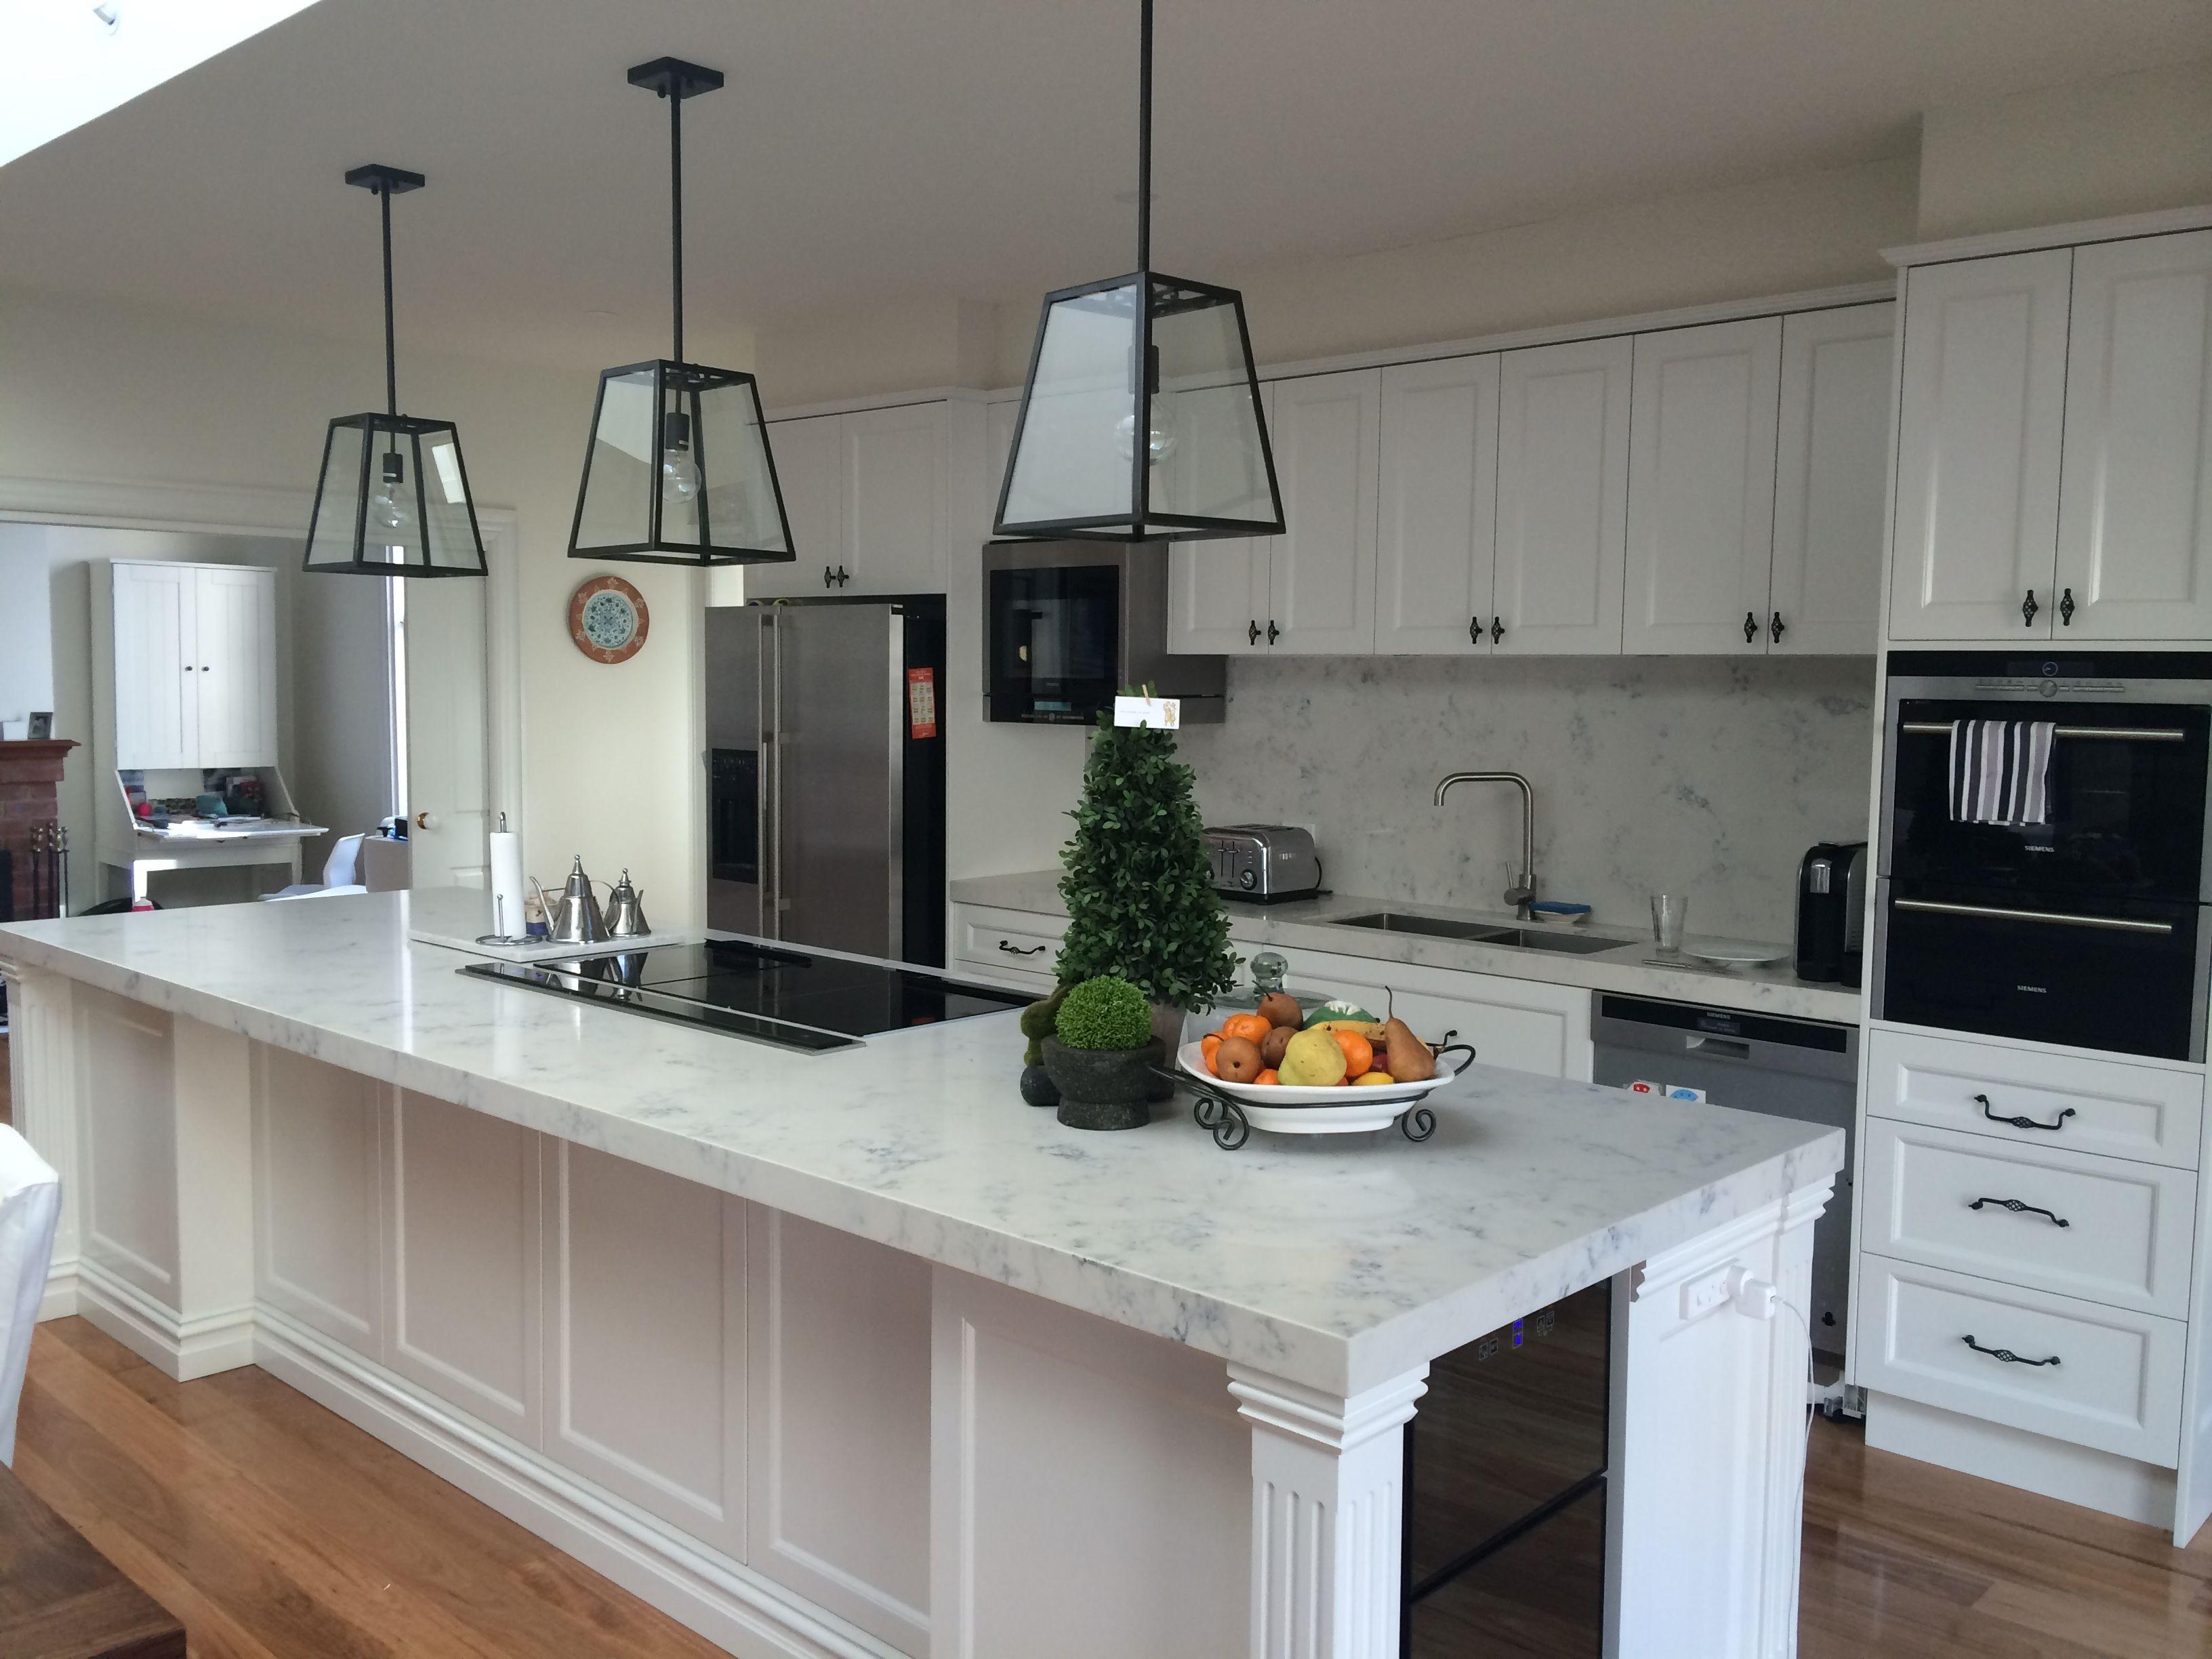 Jph Joinery Kitchen Renovation Inspiration Home Kitchens